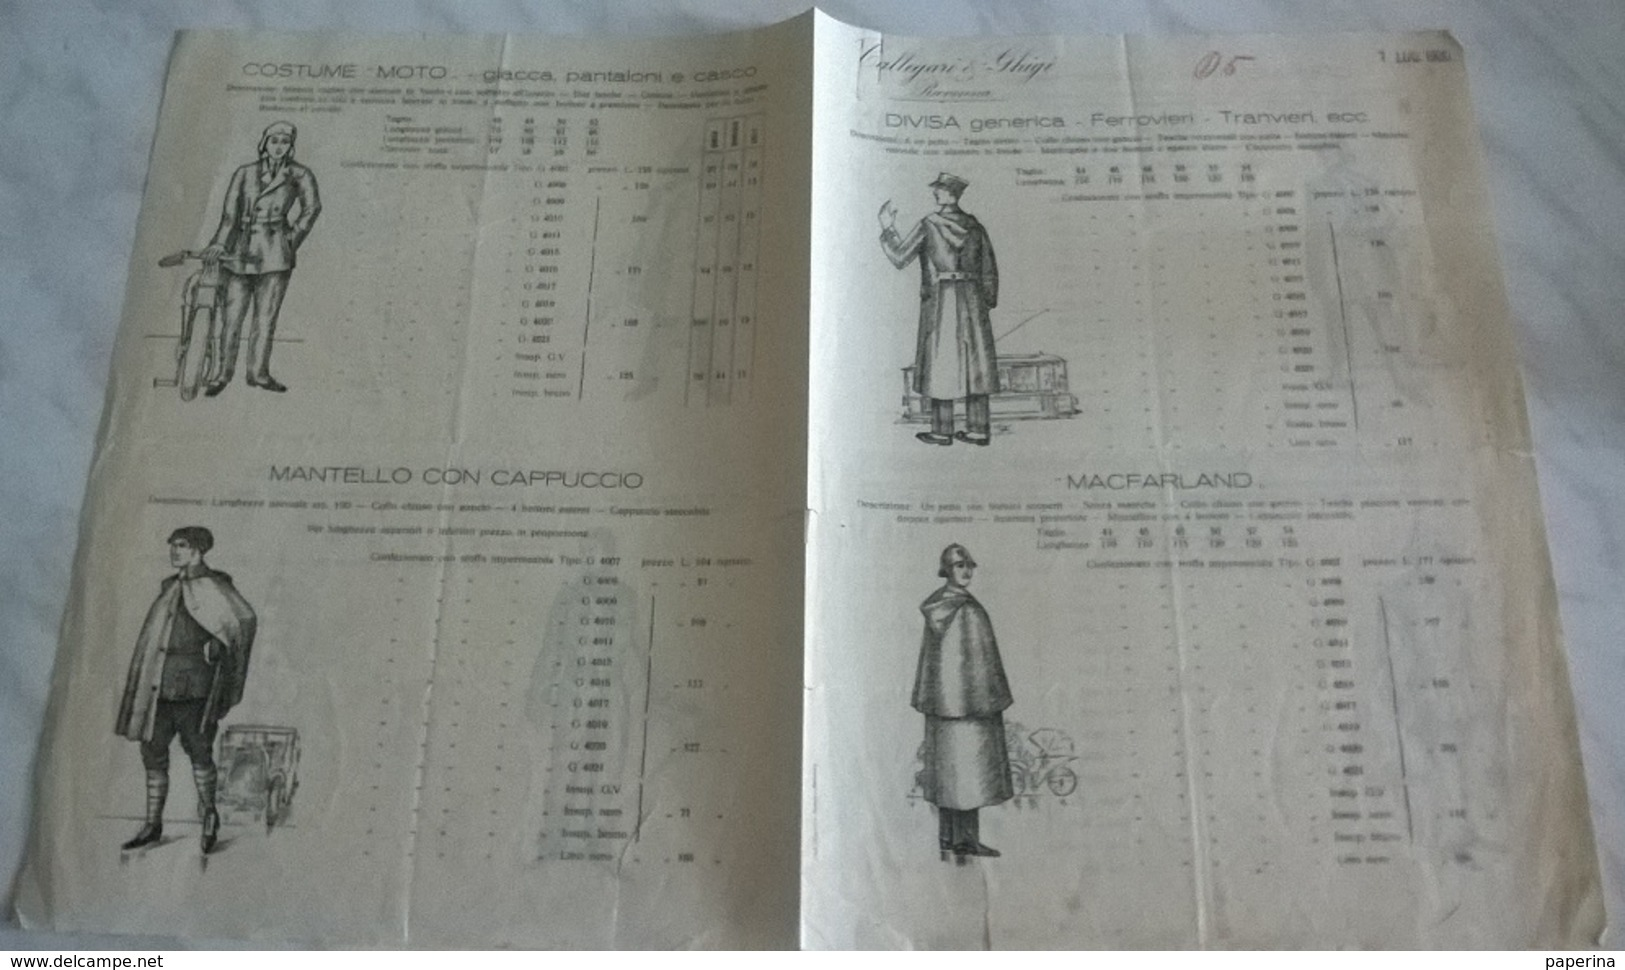 CALLEGARI & GHIGI RAVENNA 1/7/1930 DIVISE FERROVIERI, MACFARLAND, OPERAIO, MINATORE, MARINAIO, MOTO... (15) - Pubblicitari